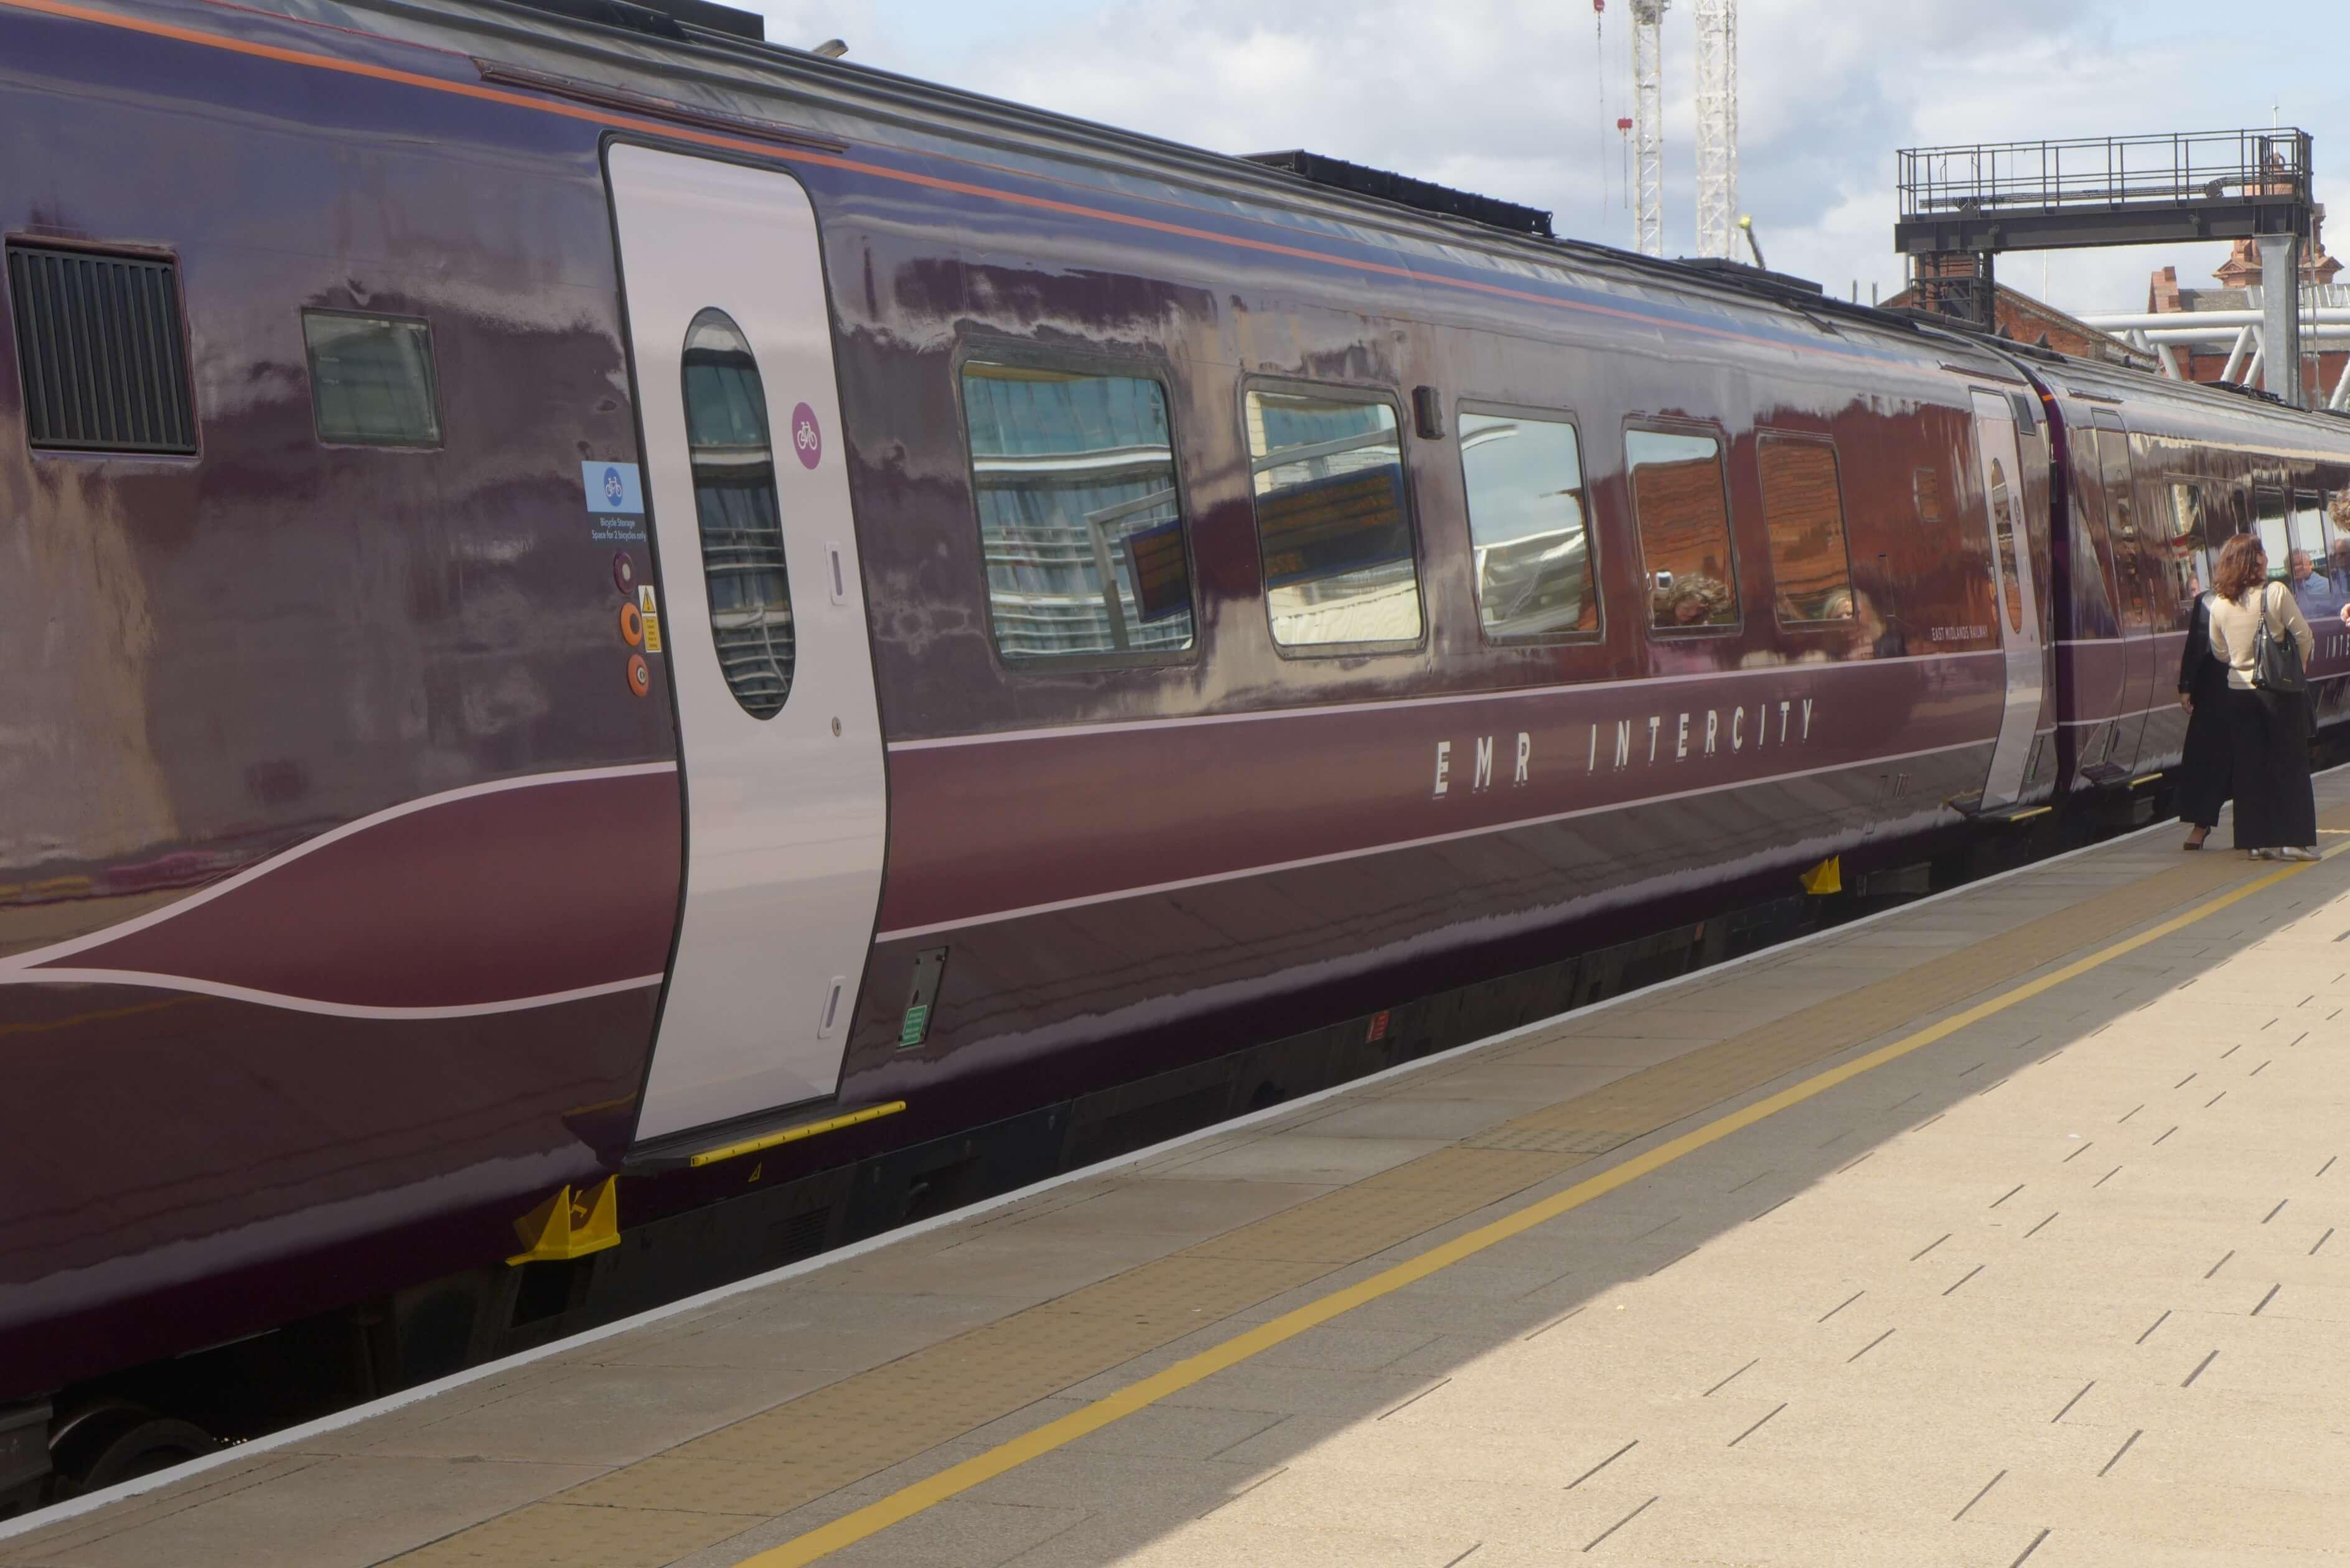 Train in new East Midlands Railway branding